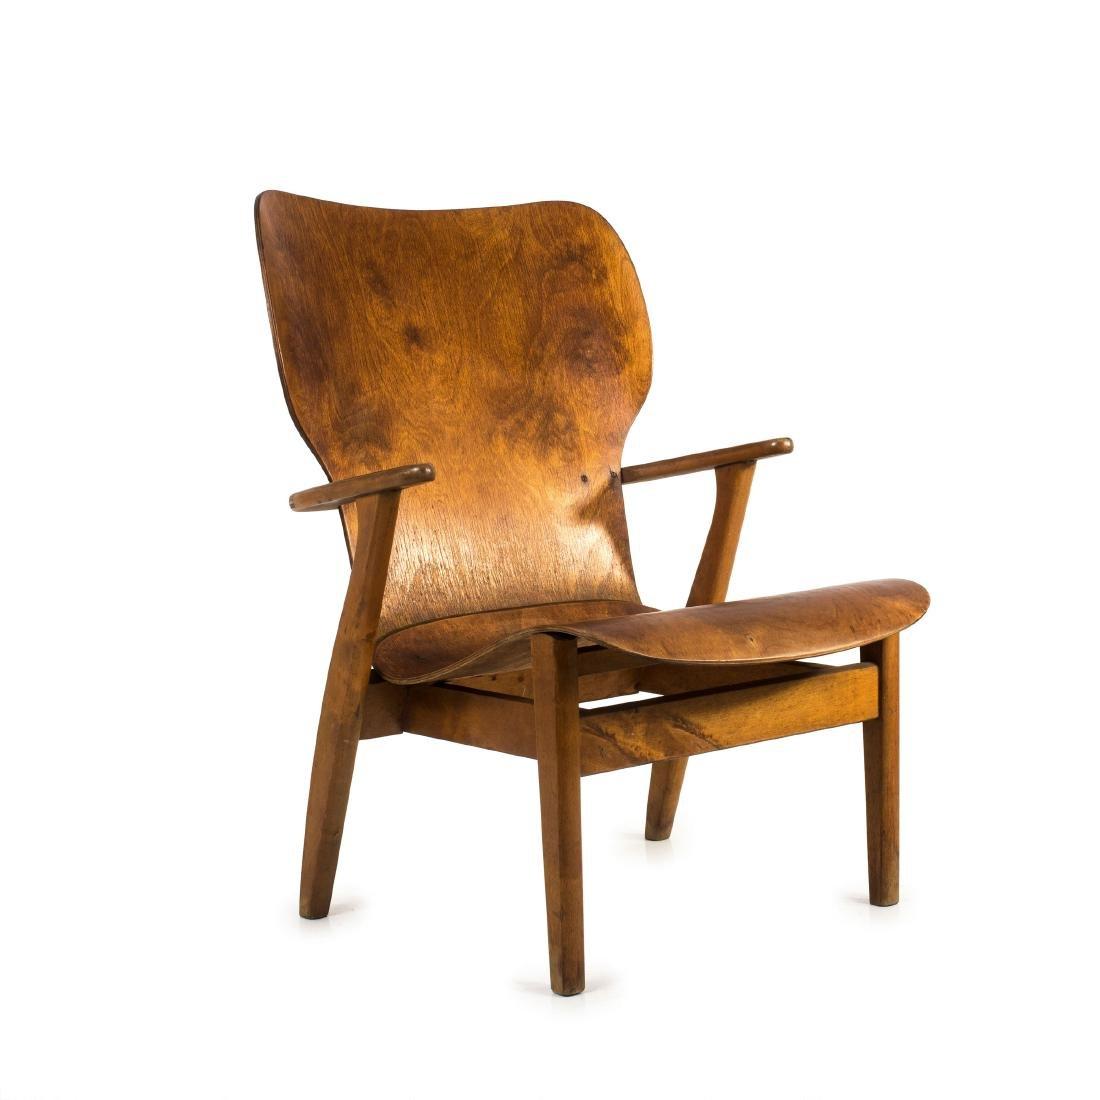 Armchair 'Domus Lux', c1948